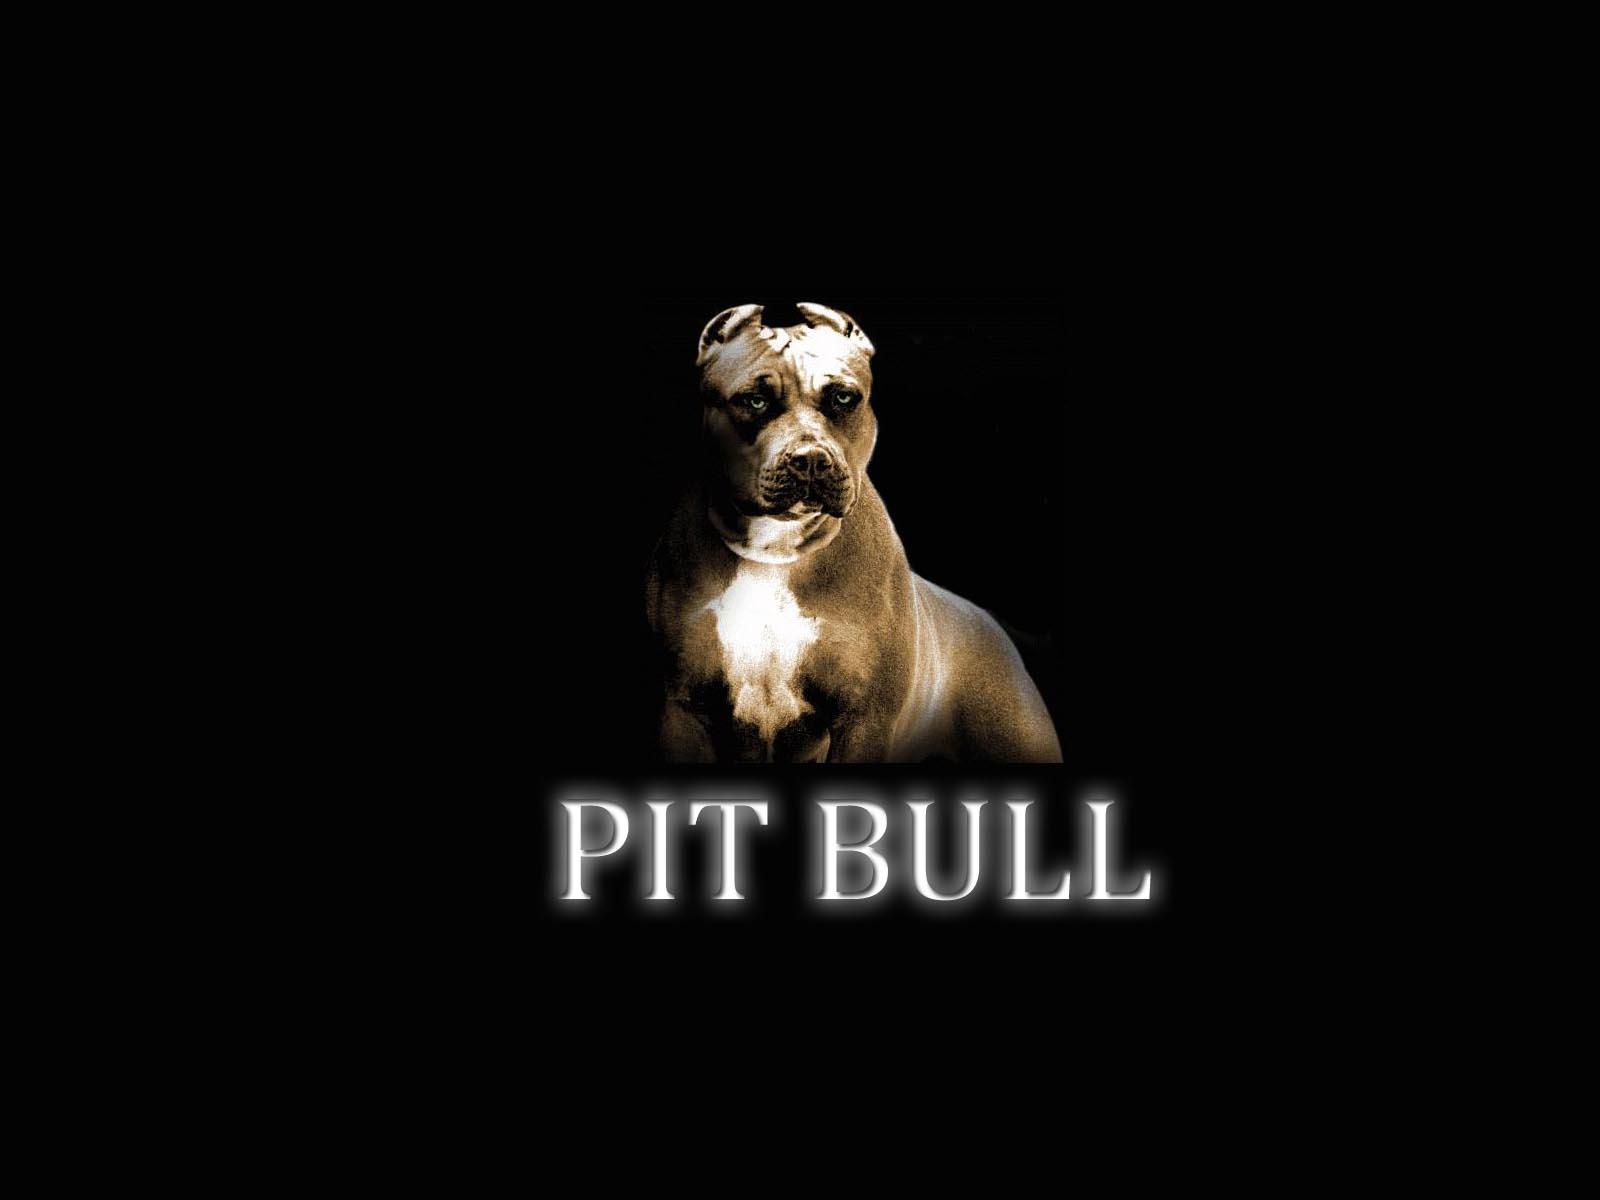 American Pit Bull Terrier Widescreen for desktop